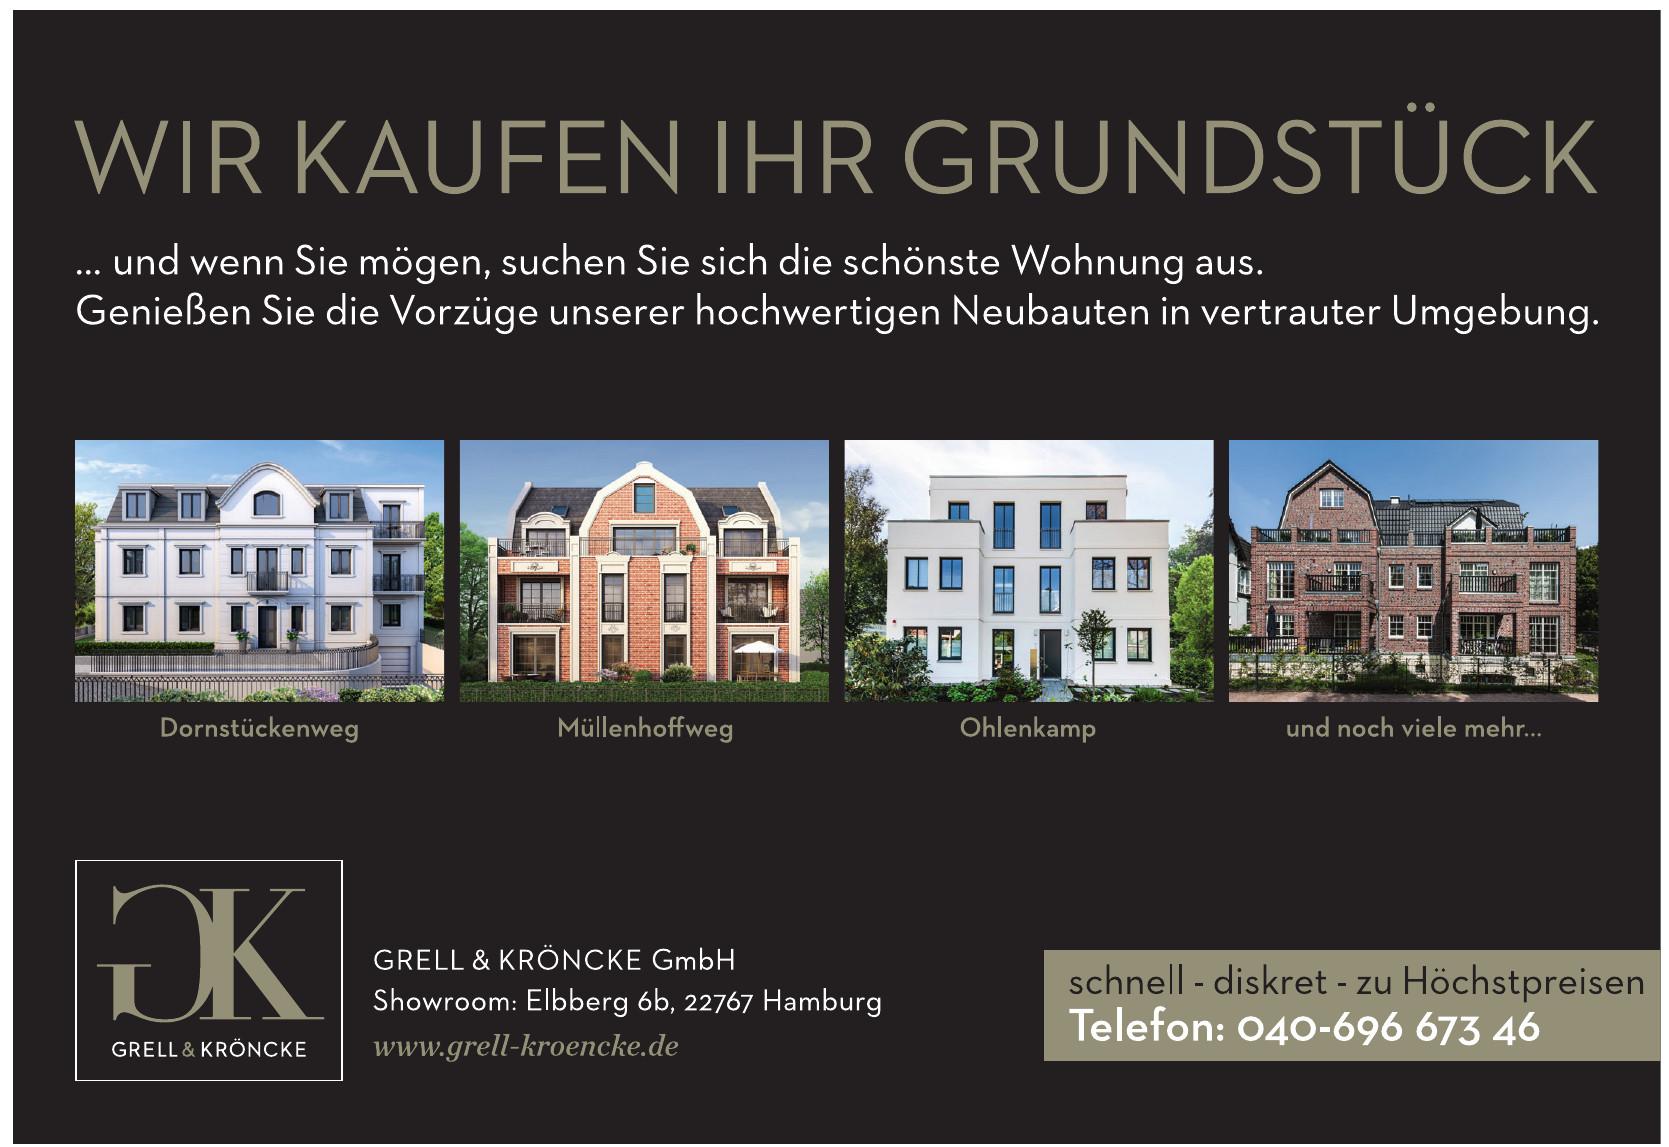 Grell & Kröncke GmbH